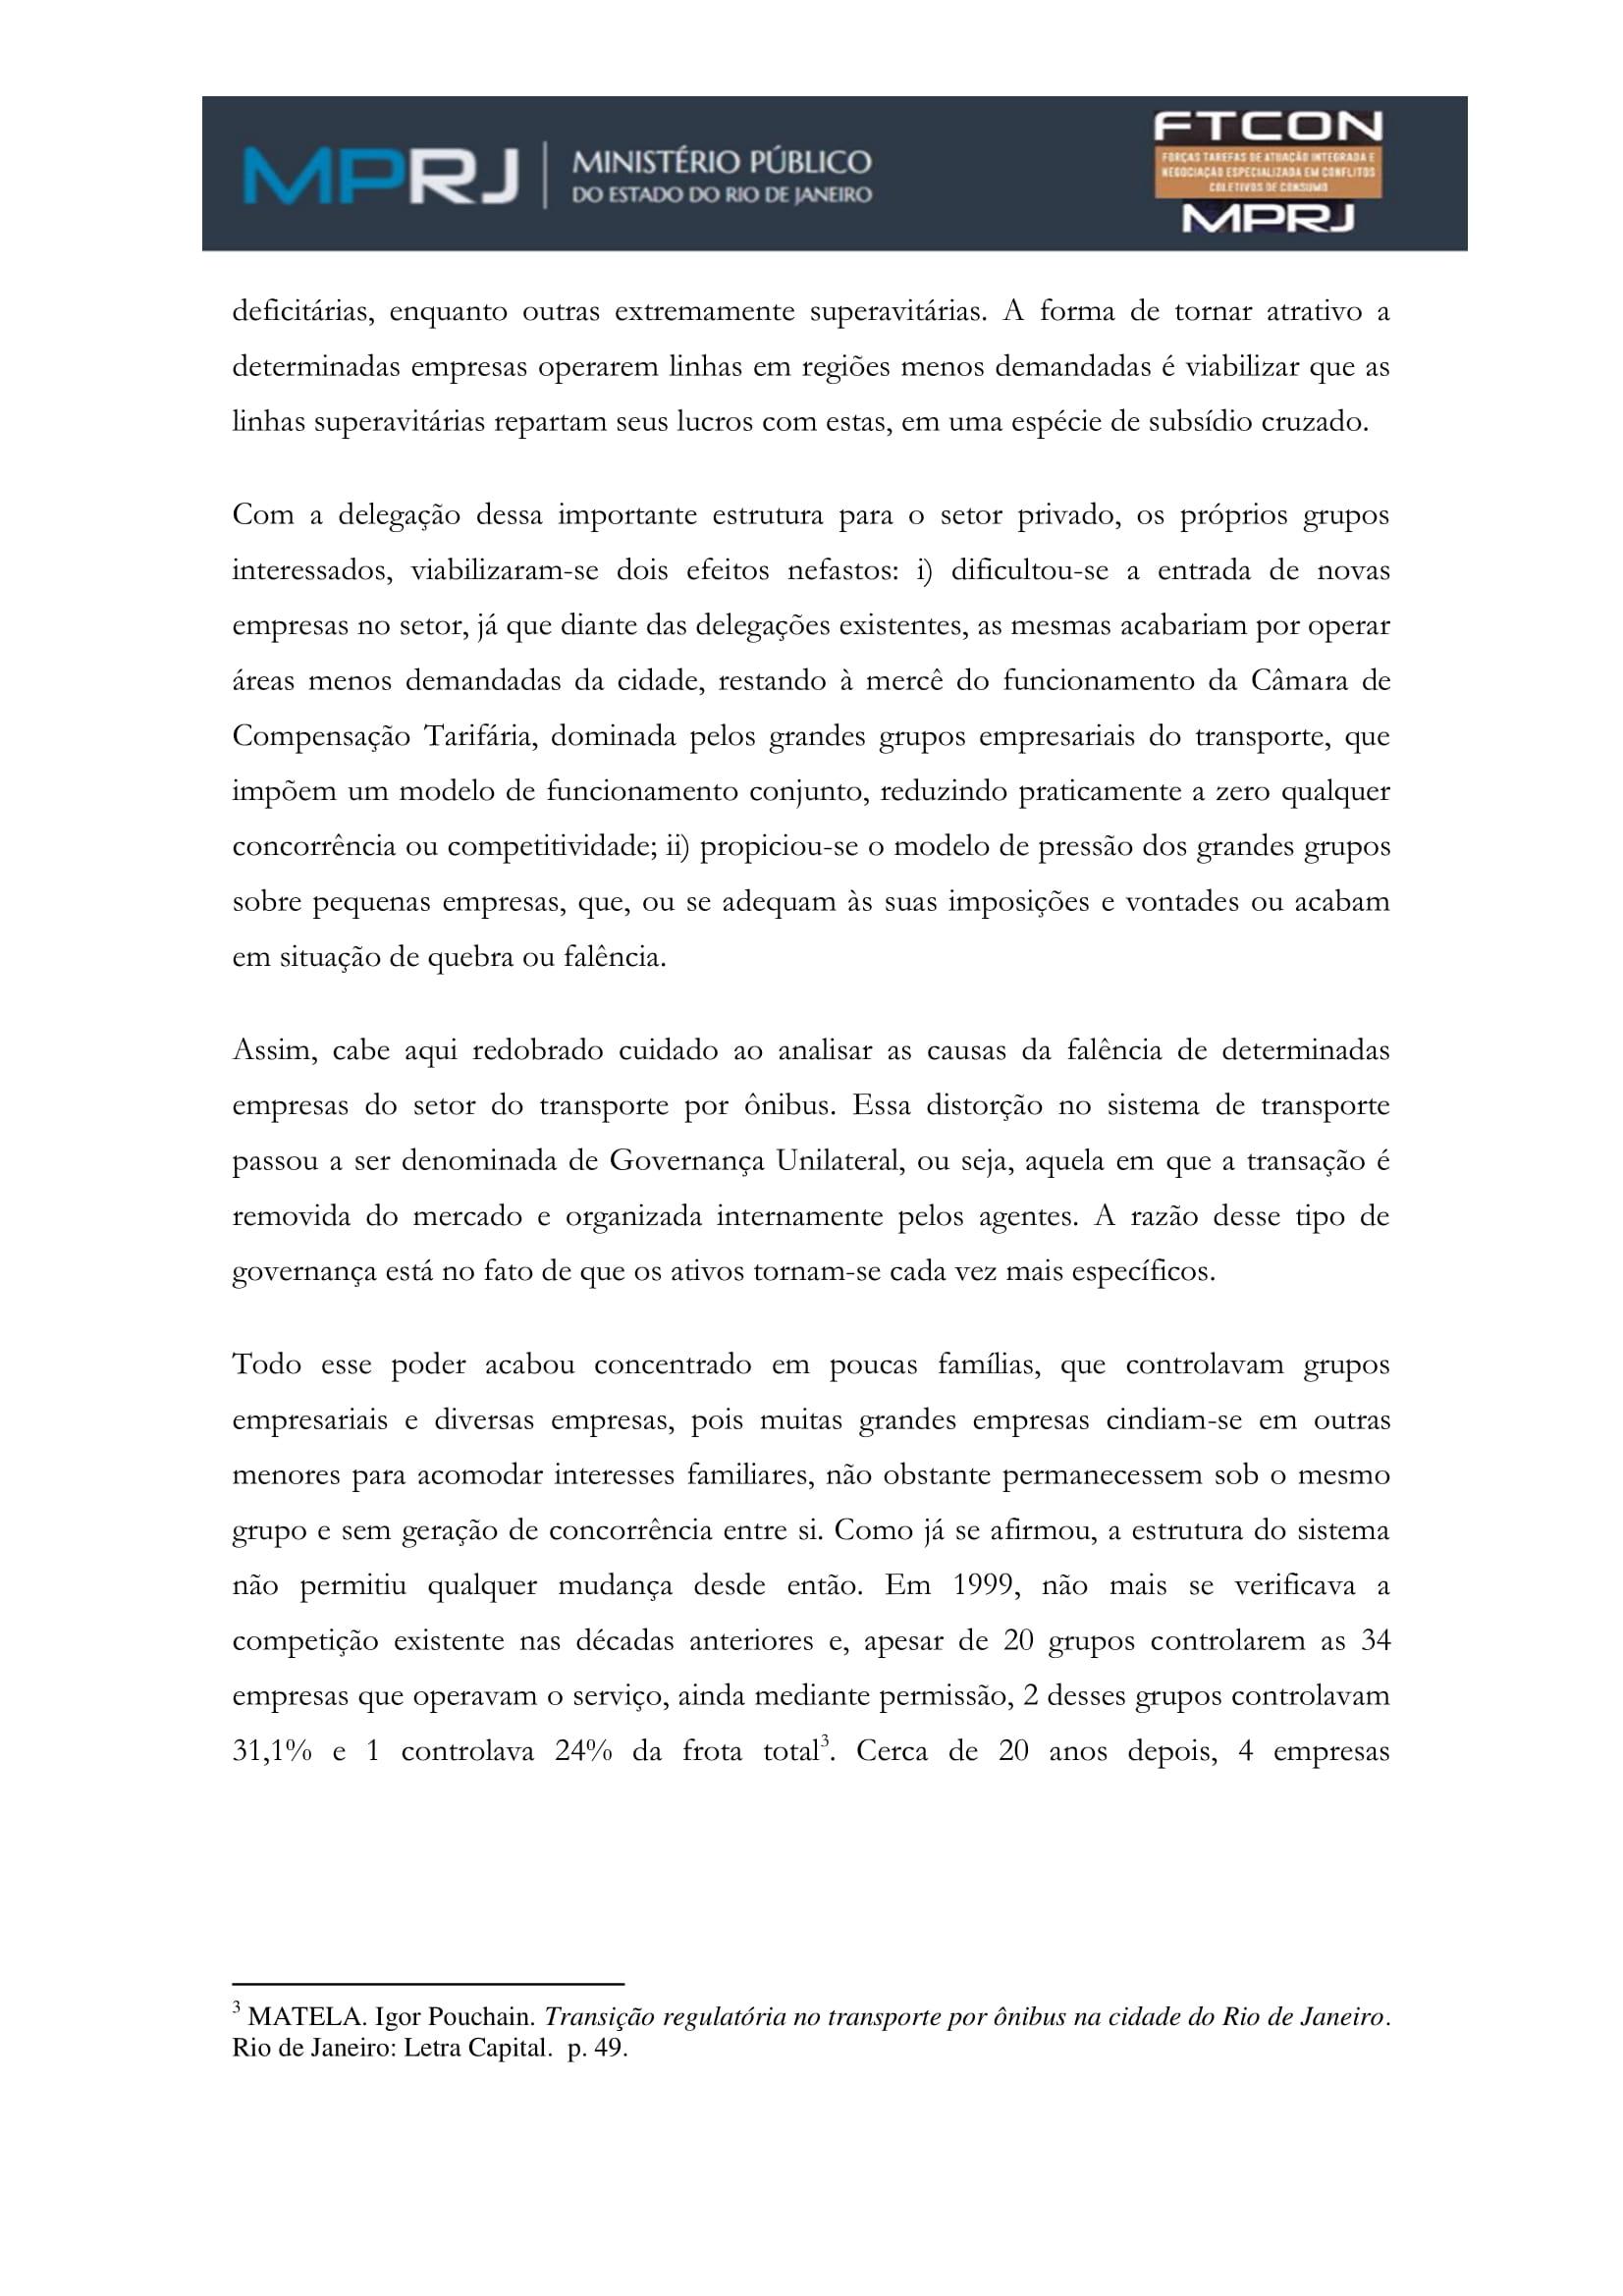 acp_caducidade_onibus_dr_rt-008